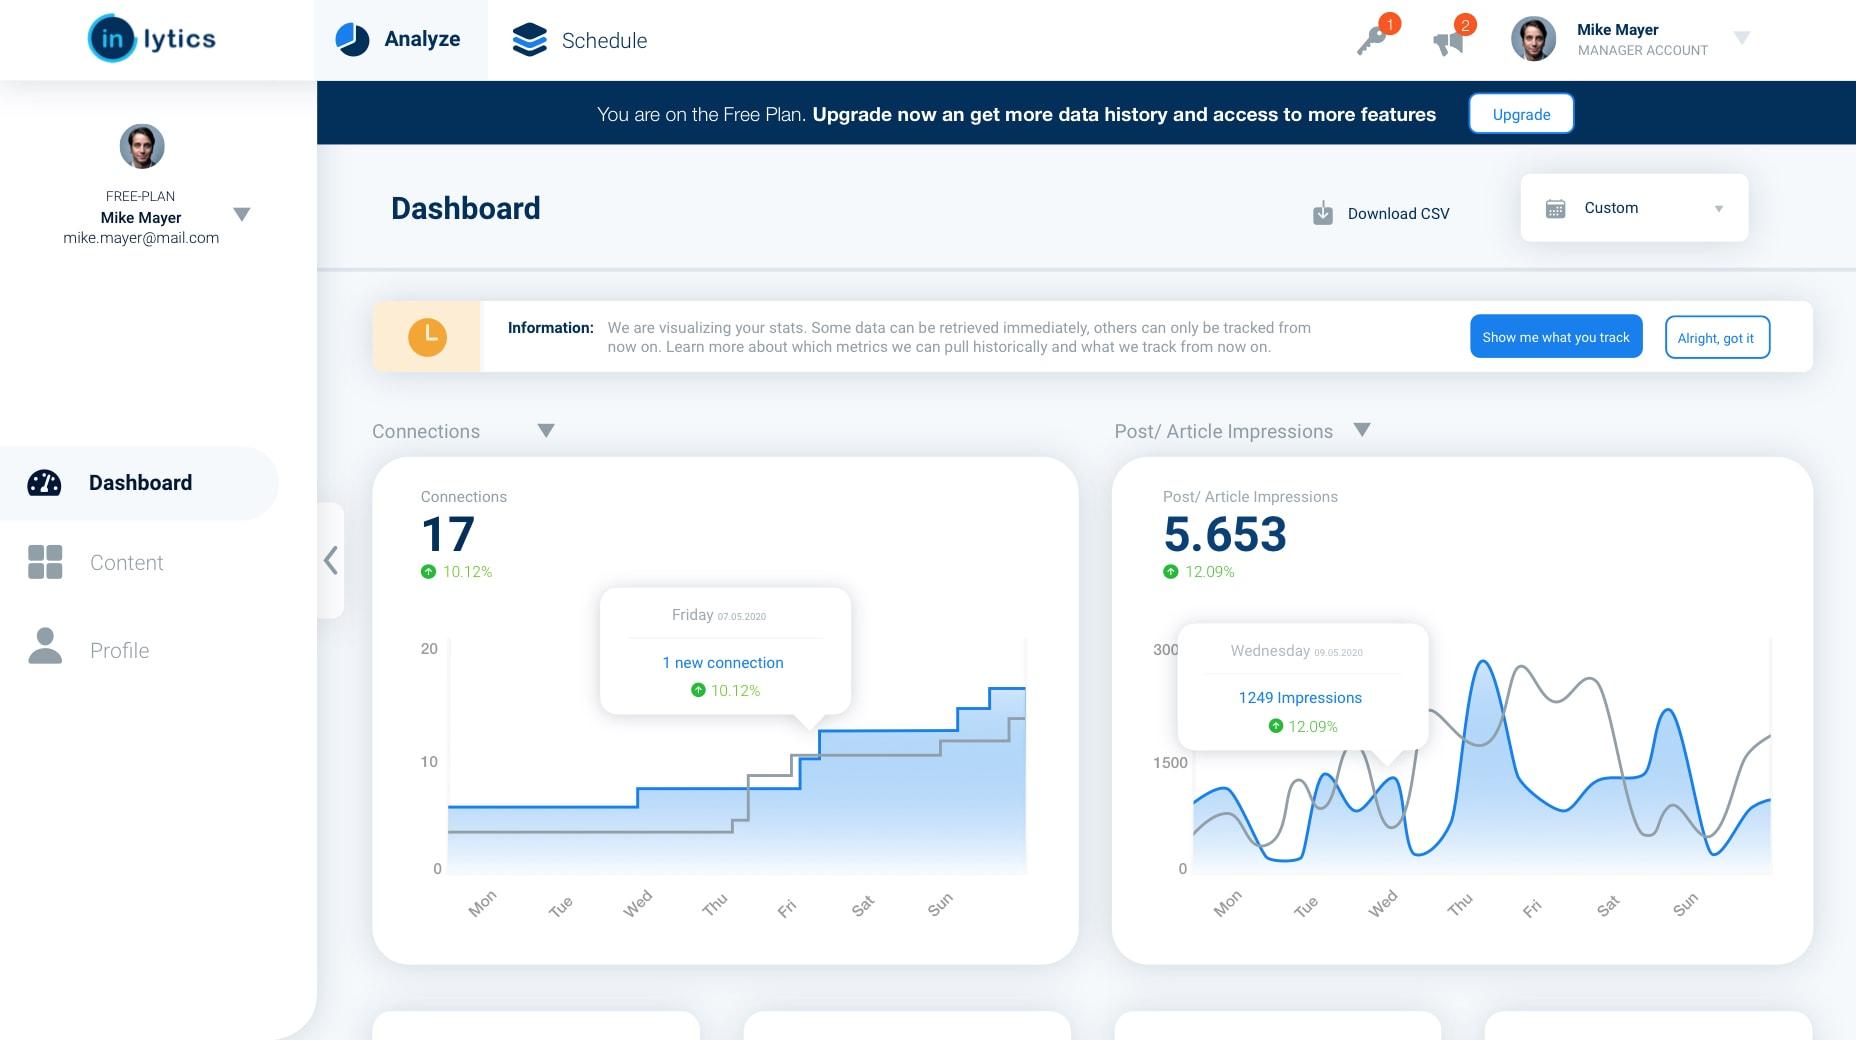 LinkedIn Analytics Dashboard for personal profiles